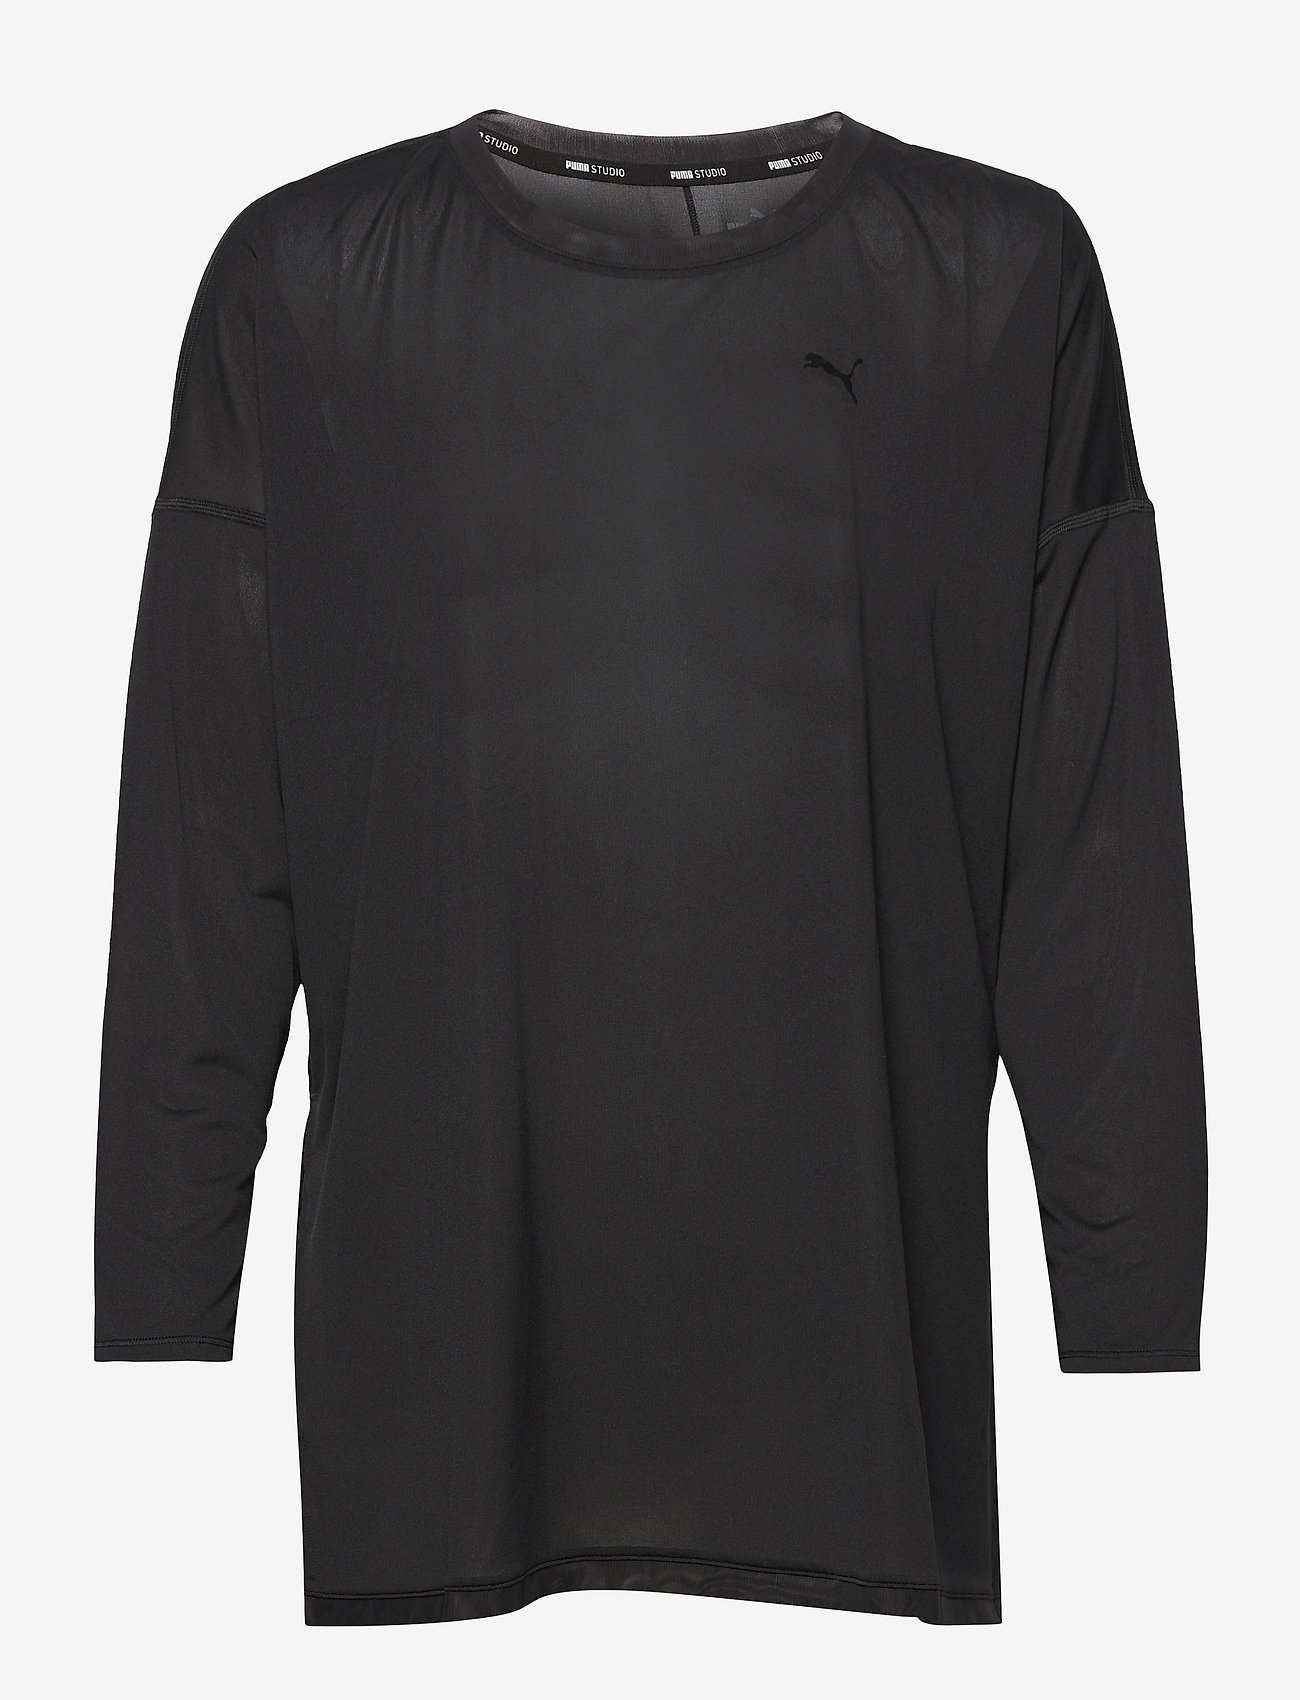 PUMA - STUDIO GRAPHENE LONG SLEEVE TOP - topjes met lange mouwen - puma black - 1